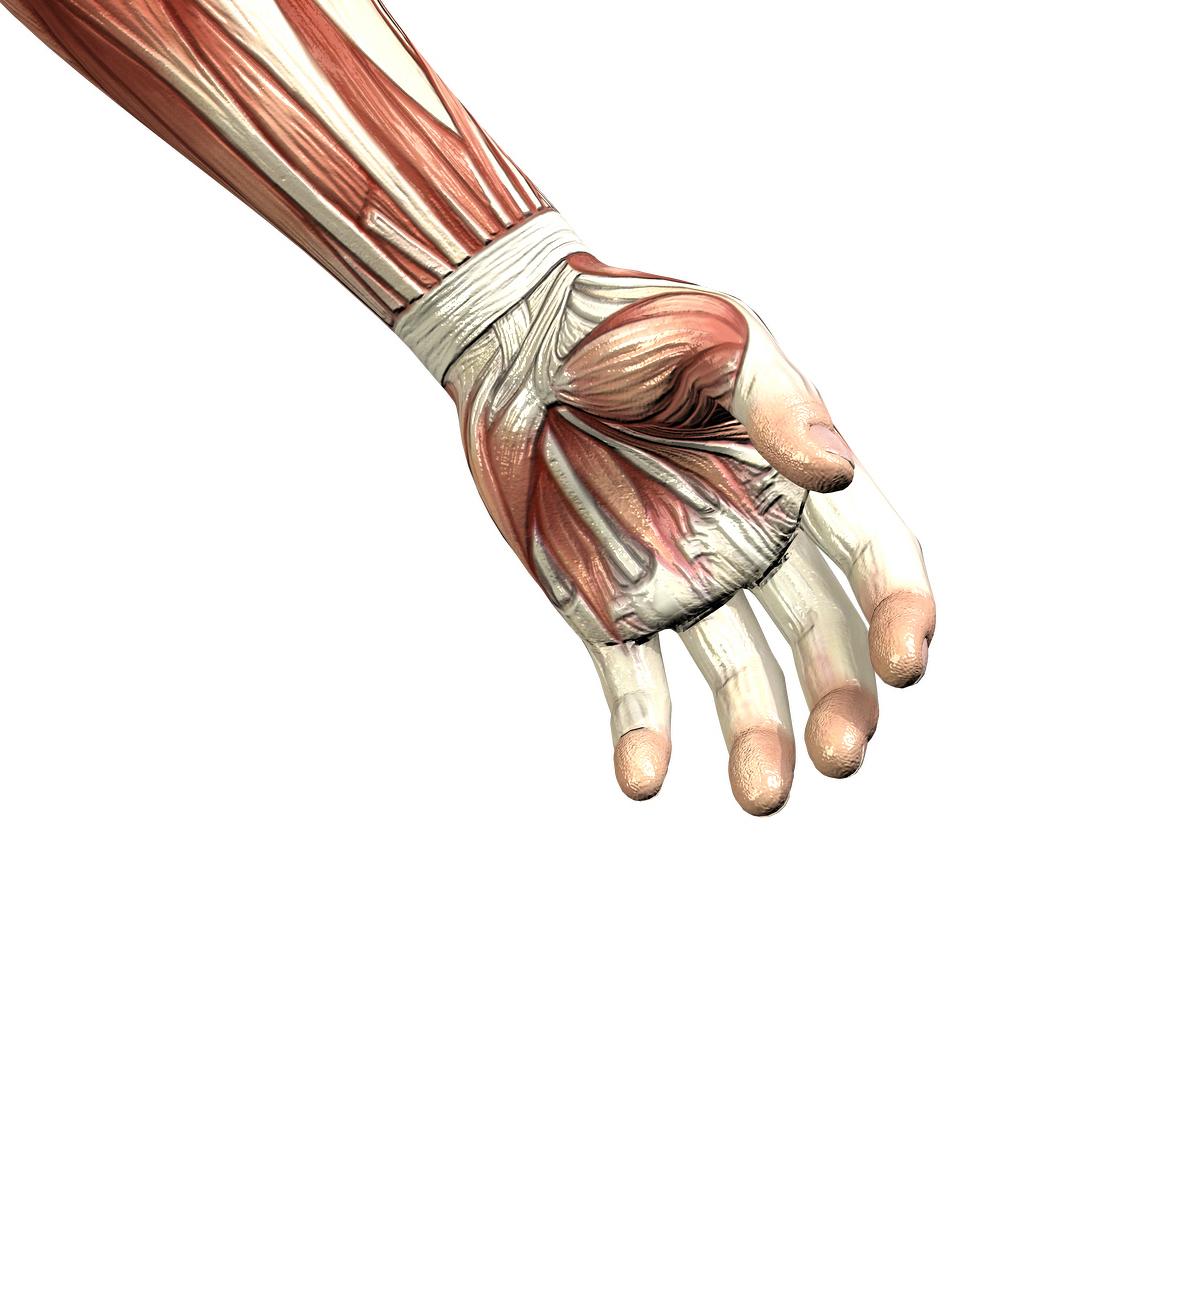 Left Wrist